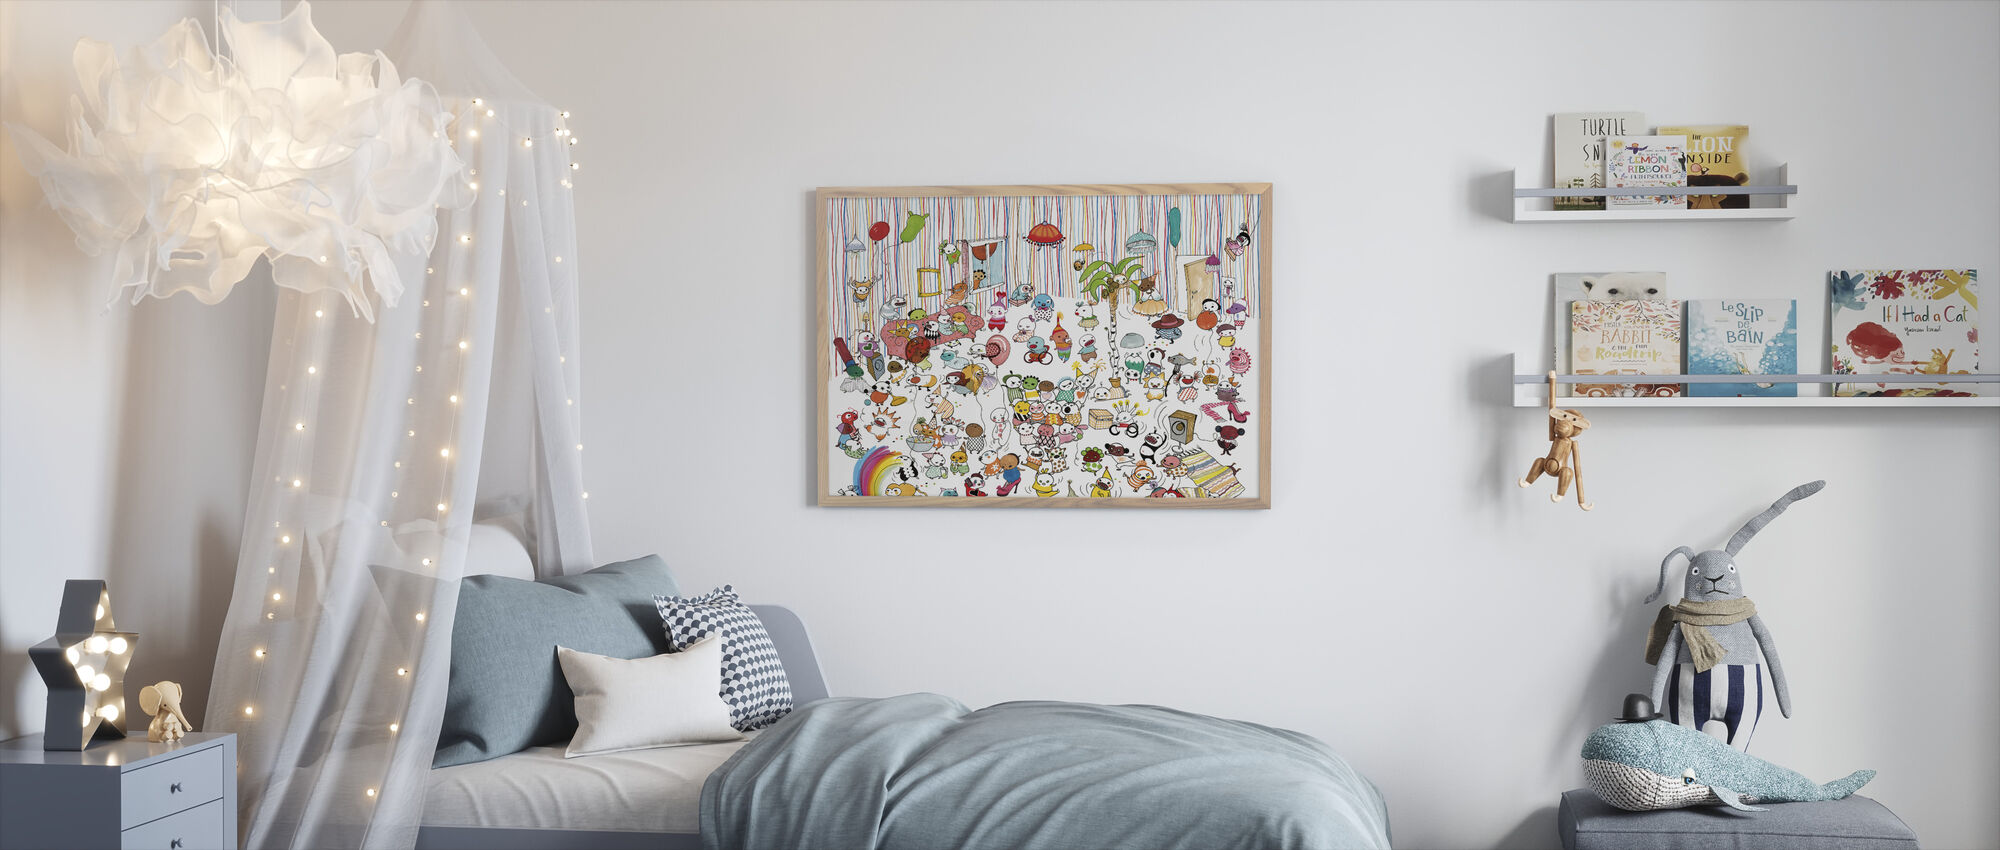 Motley Party 3 - Framed print - Kids Room